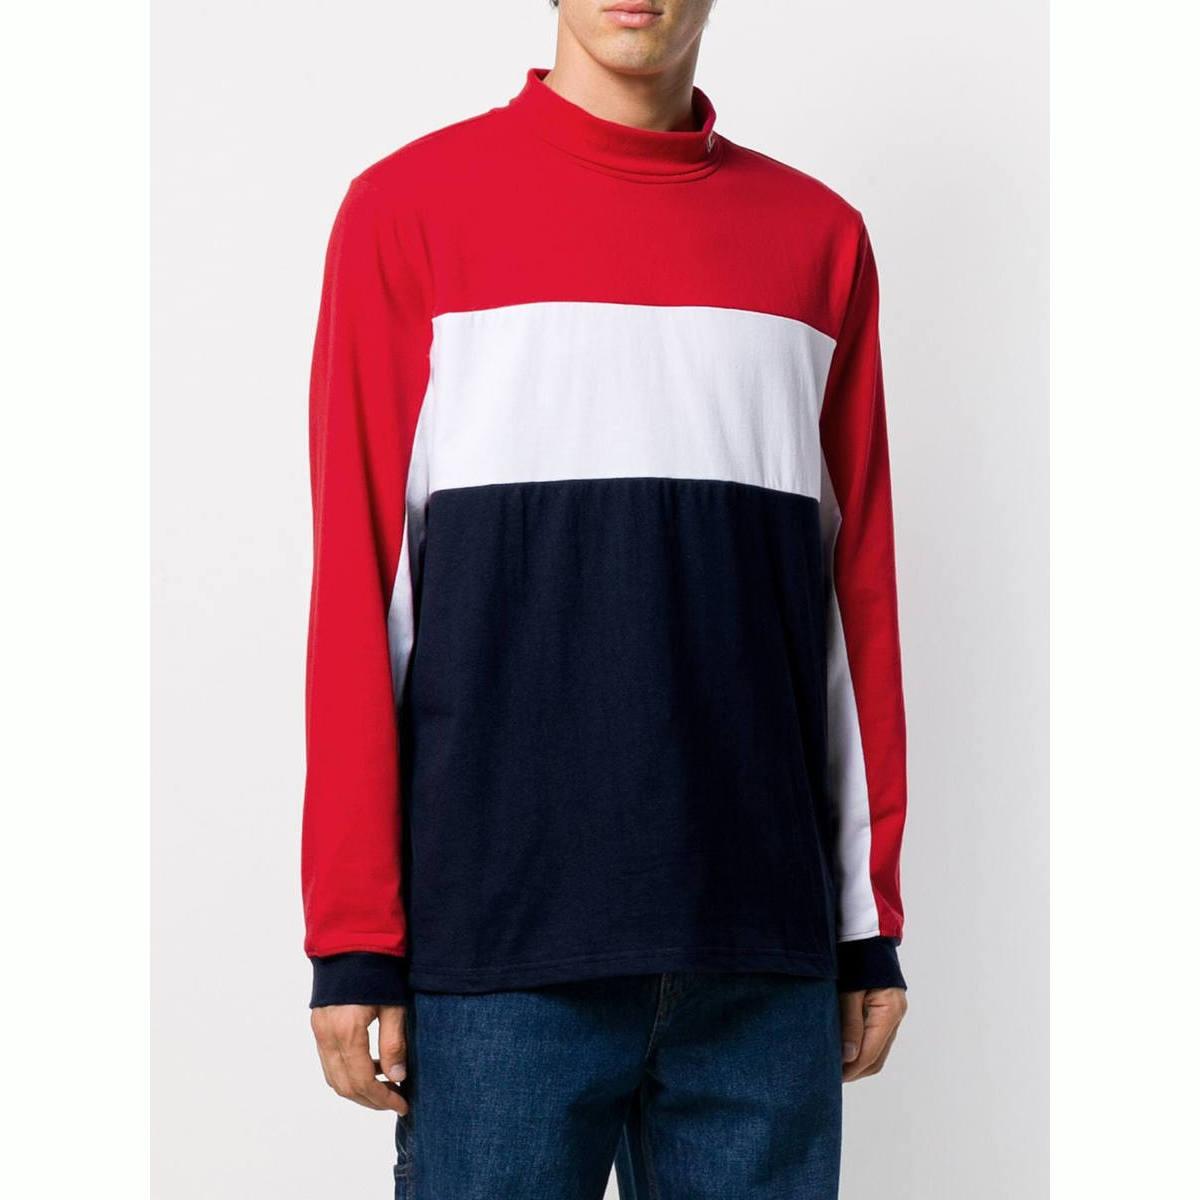 Fila|Matteo rollneck sweatshirt